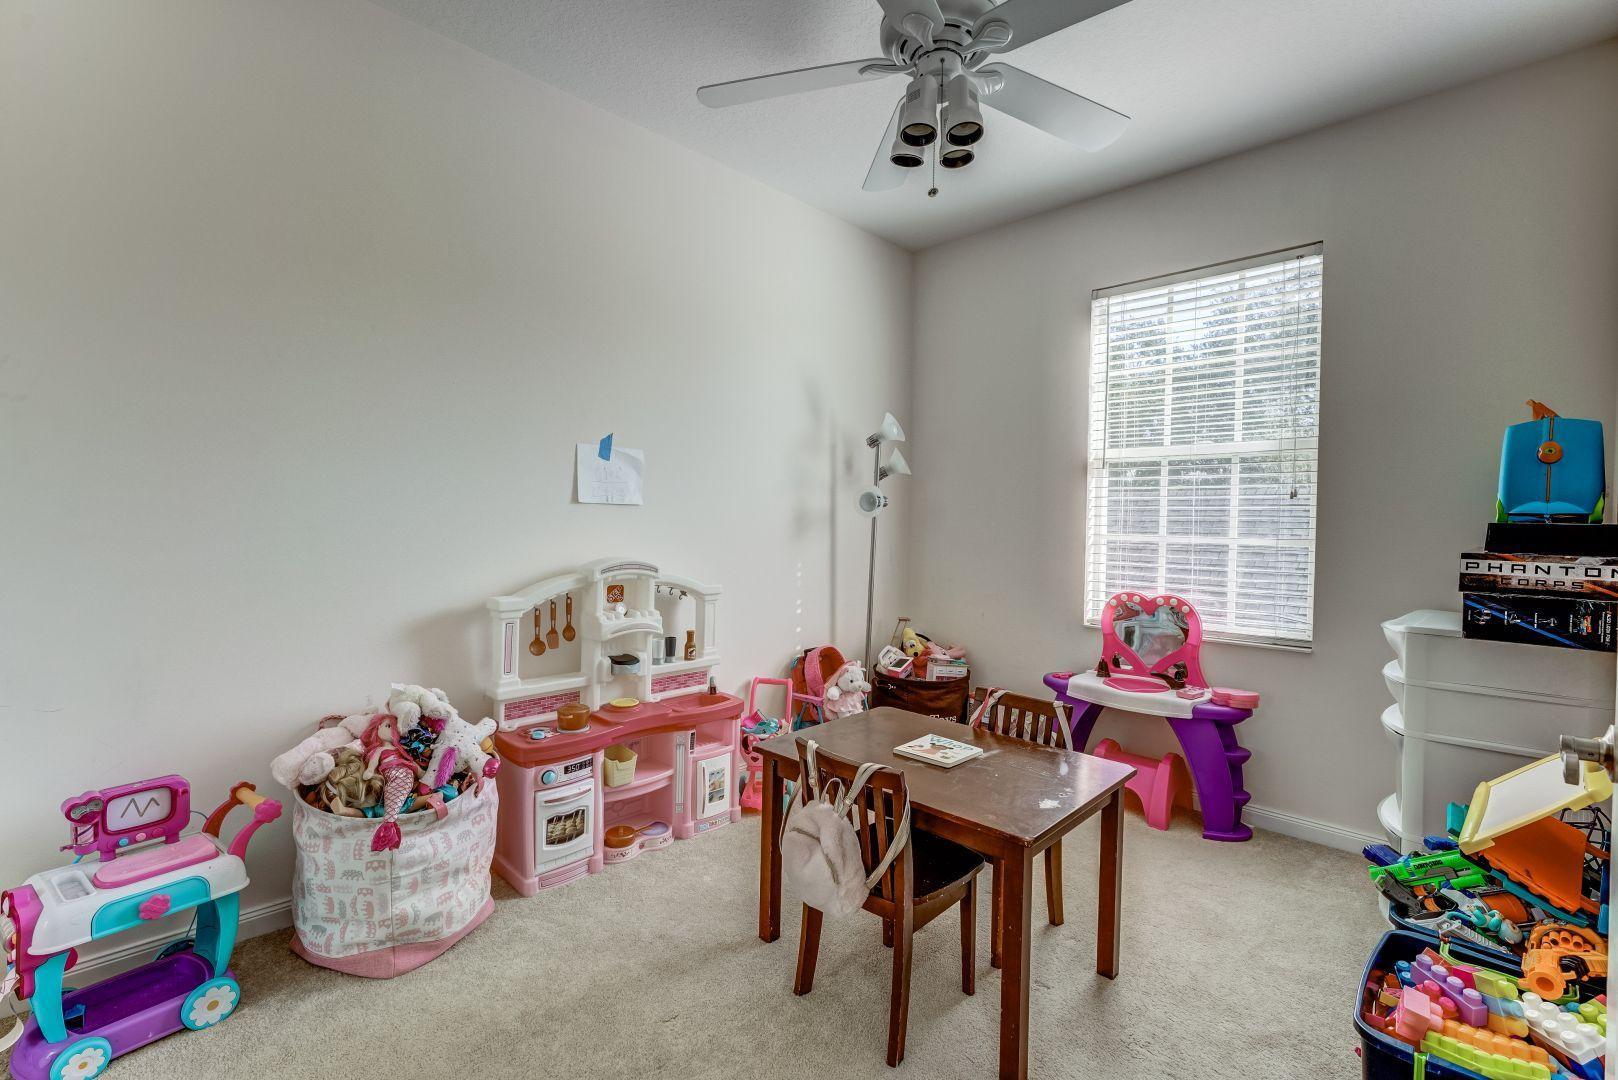 147 Bermuda Drive, Jupiter, Florida 33458, 3 Bedrooms Bedrooms, ,2.1 BathroomsBathrooms,A,Townhouse,Bermuda,RX-10497570